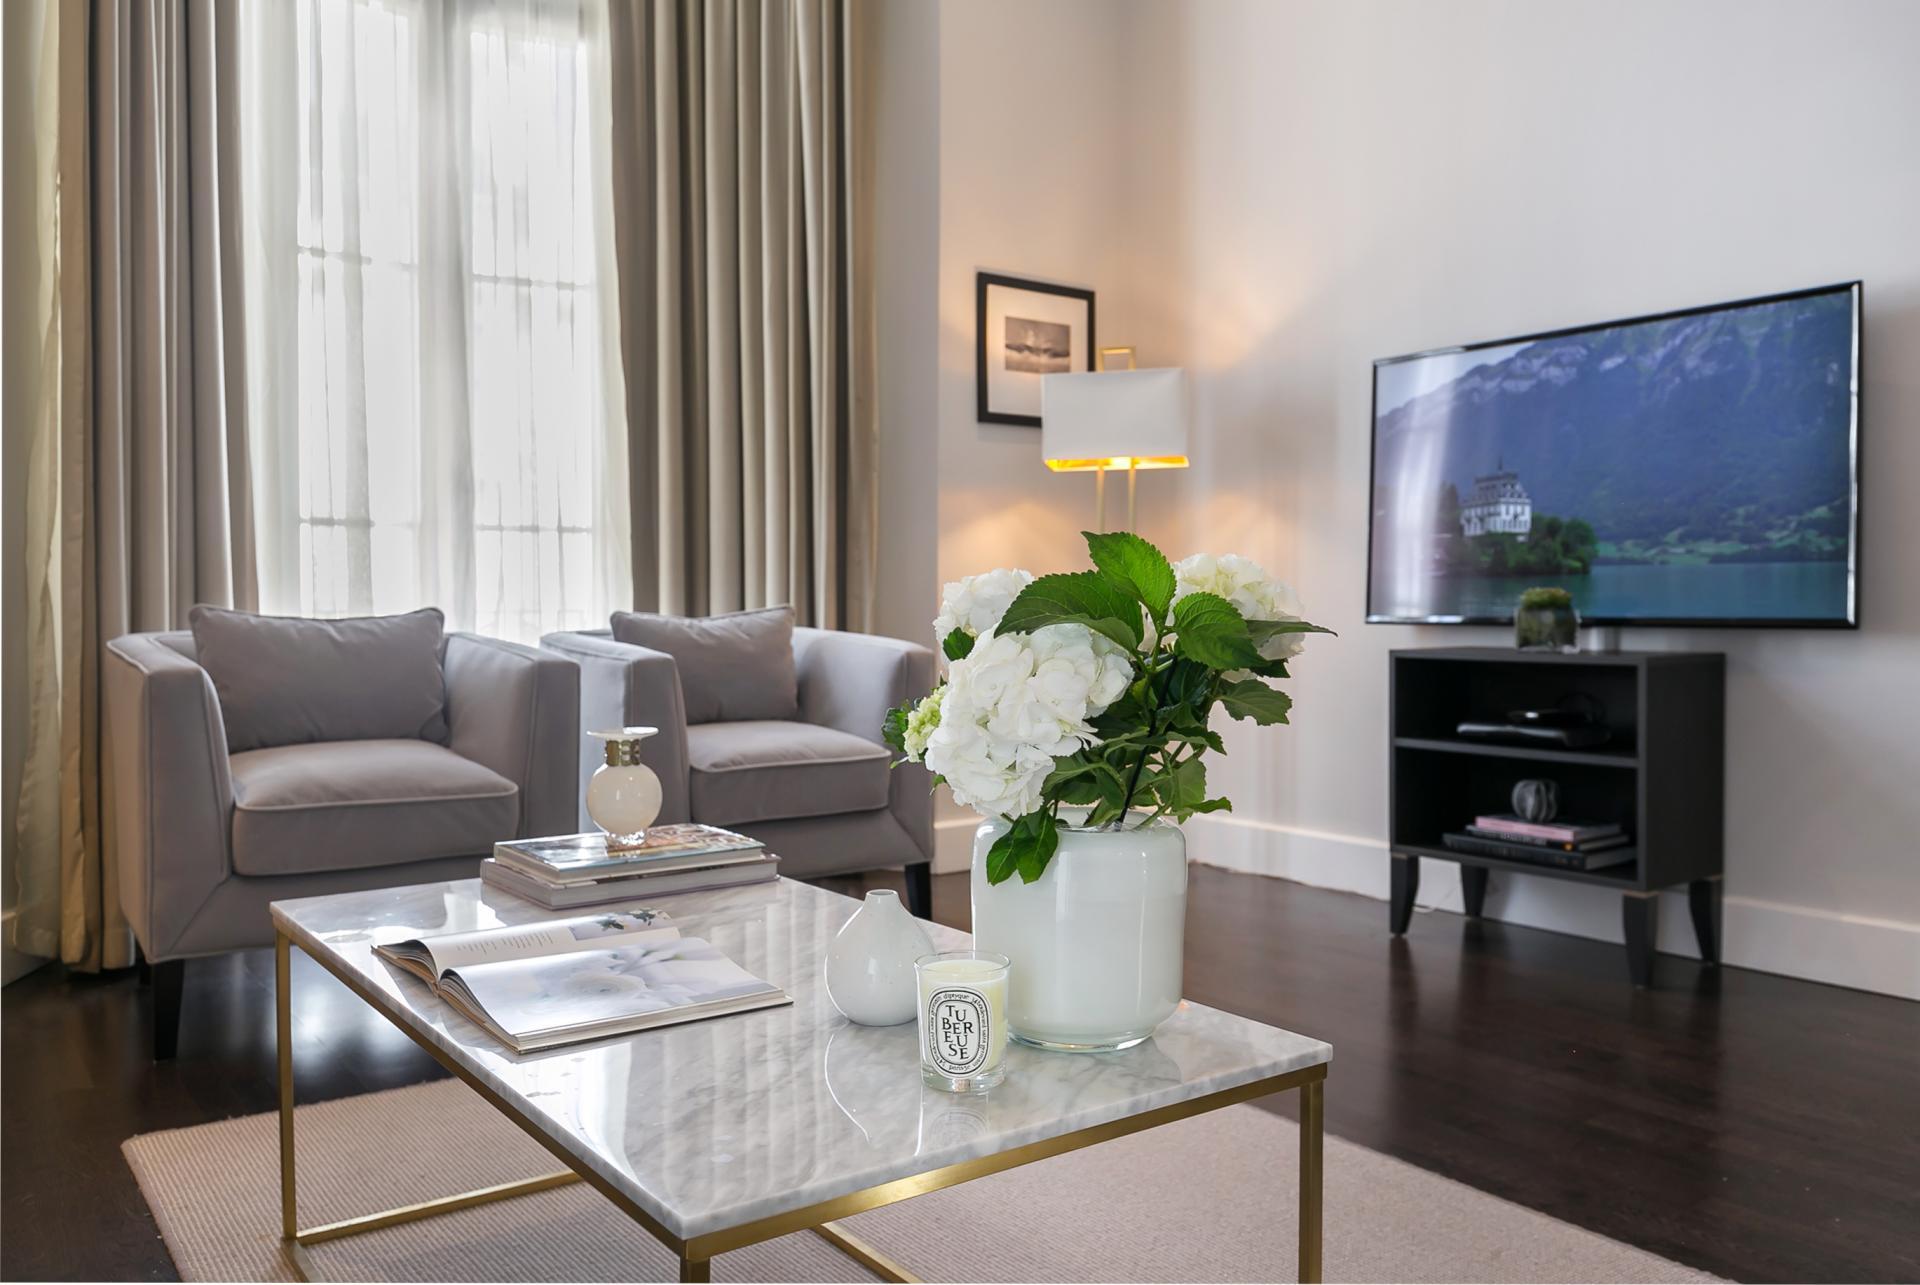 TV at Chilworth Court Serviced Apartments, Paddington, London